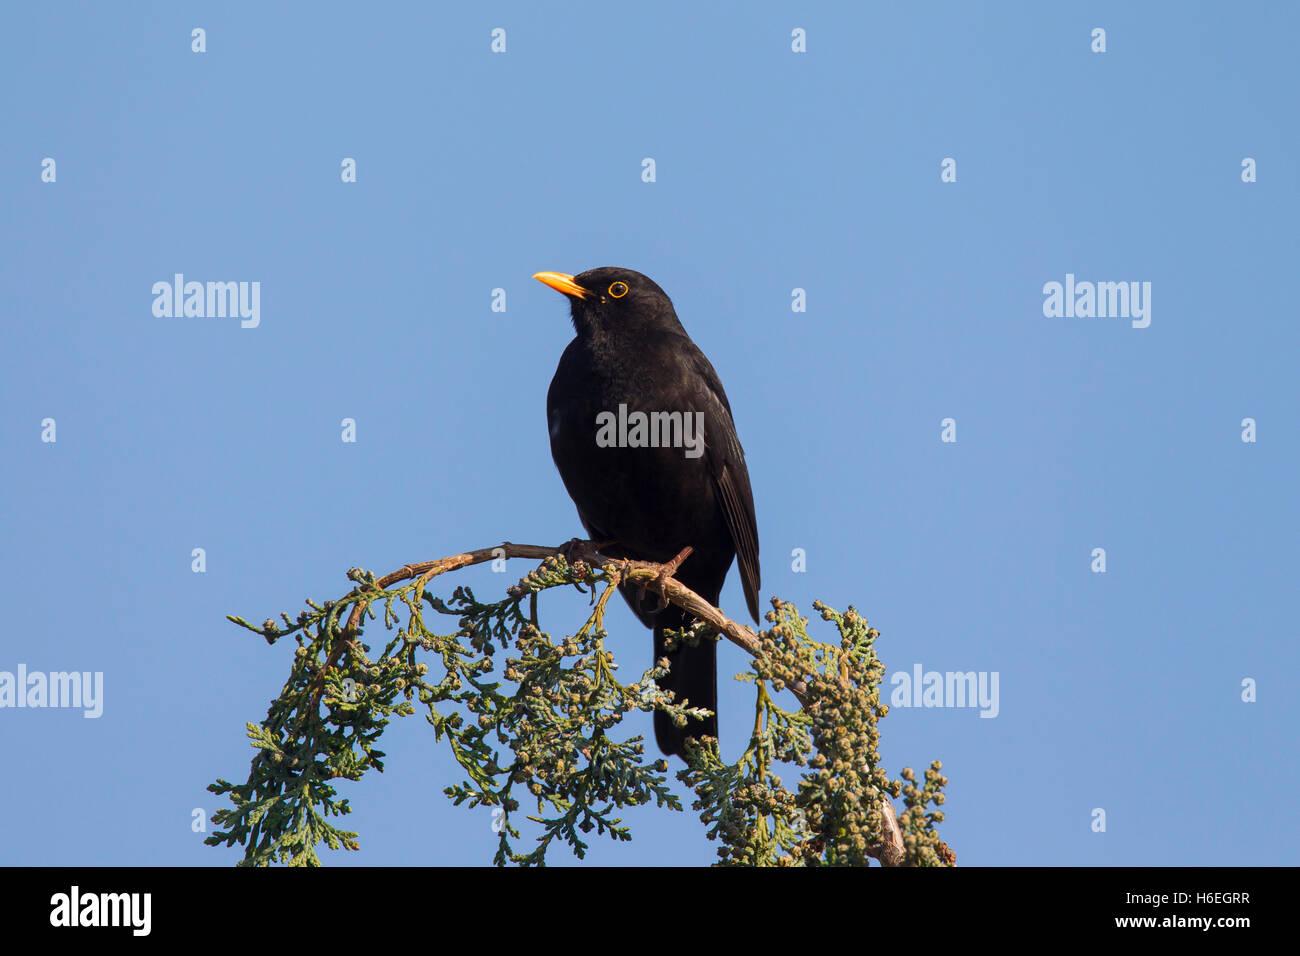 Common blackbird (Turdus merula) male perched in tree - Stock Image